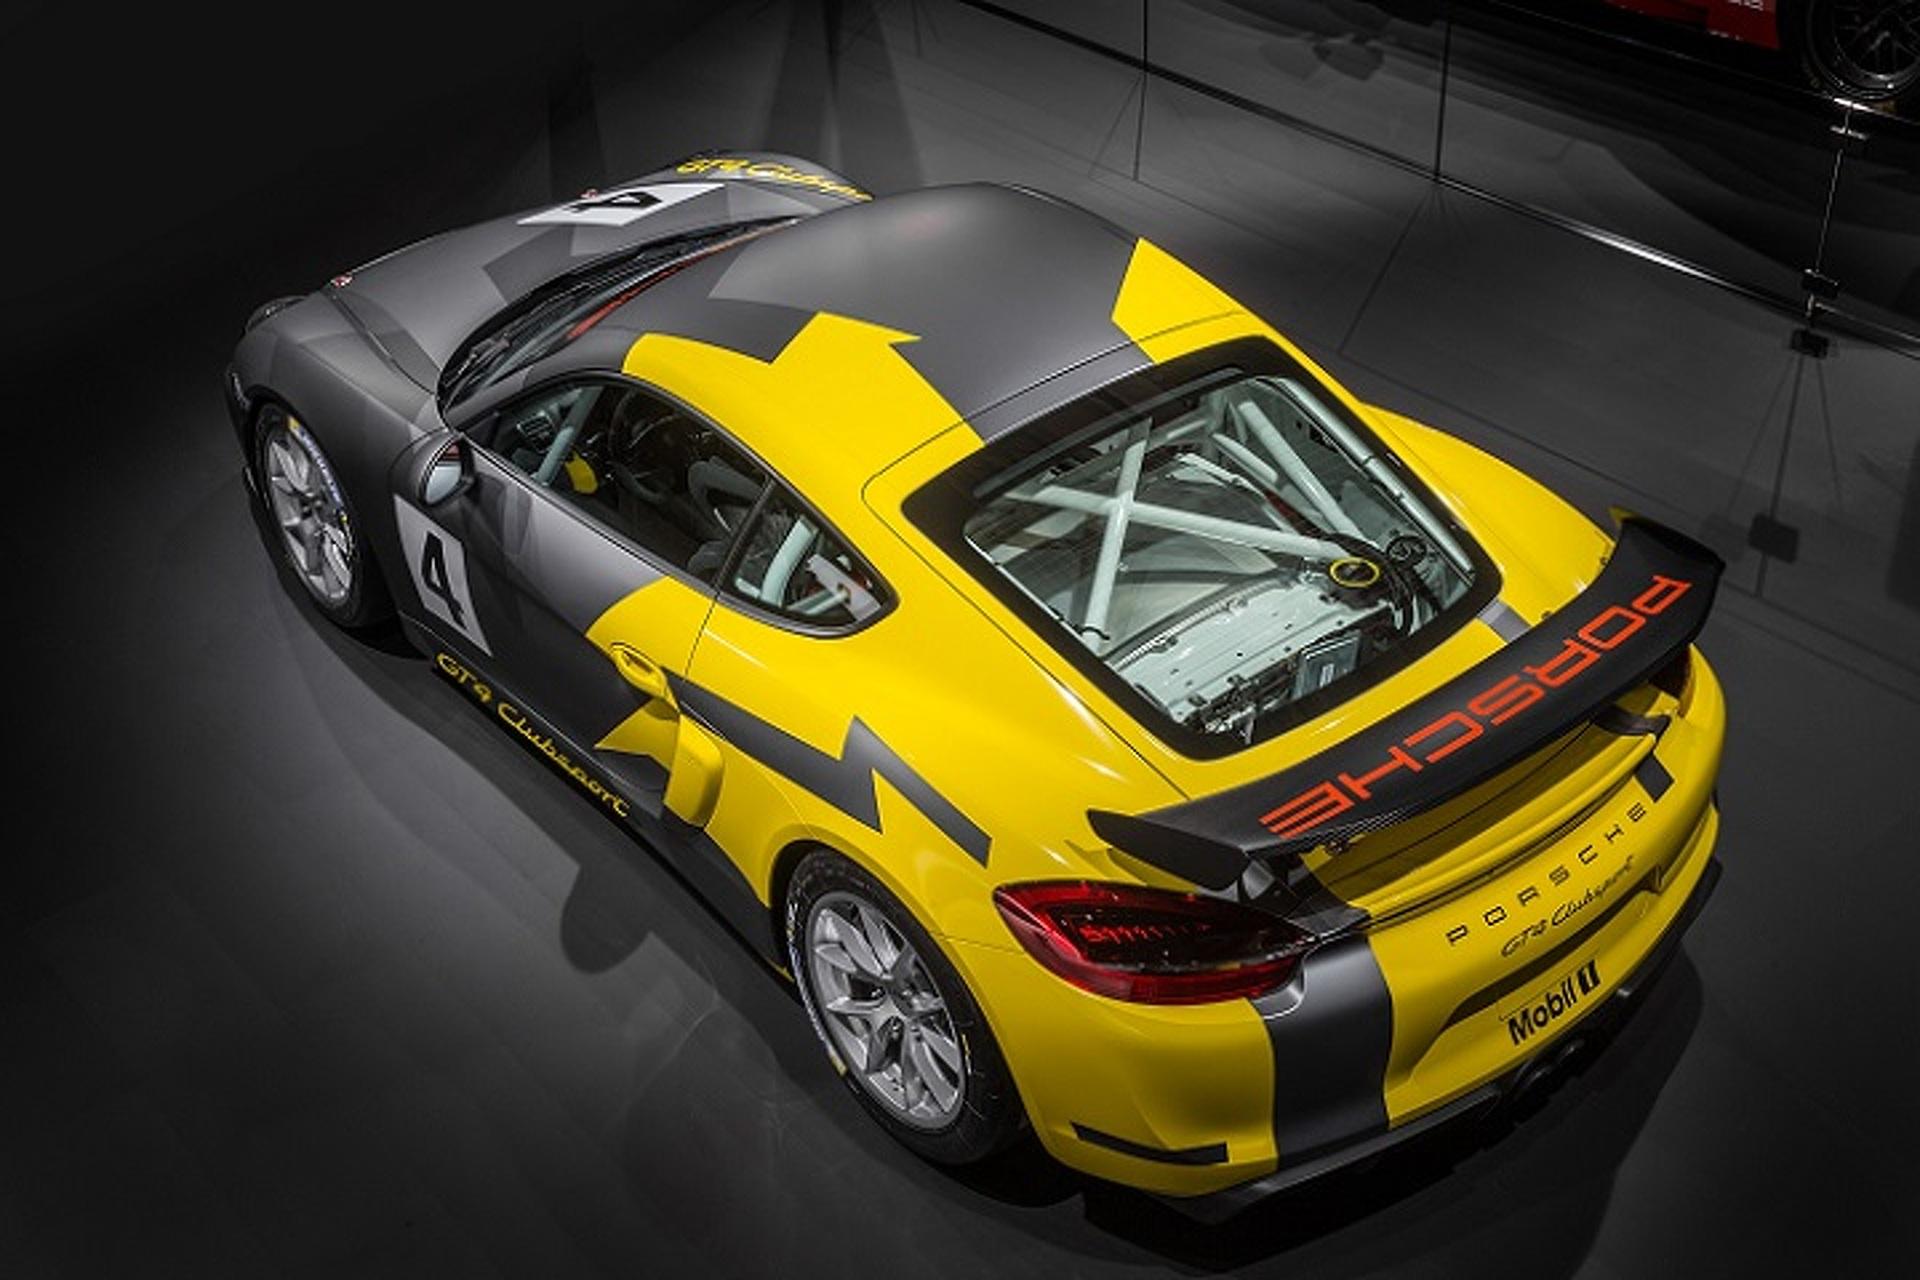 Porsche Cayman GT4 Clubsport Lets You Race on a Budget